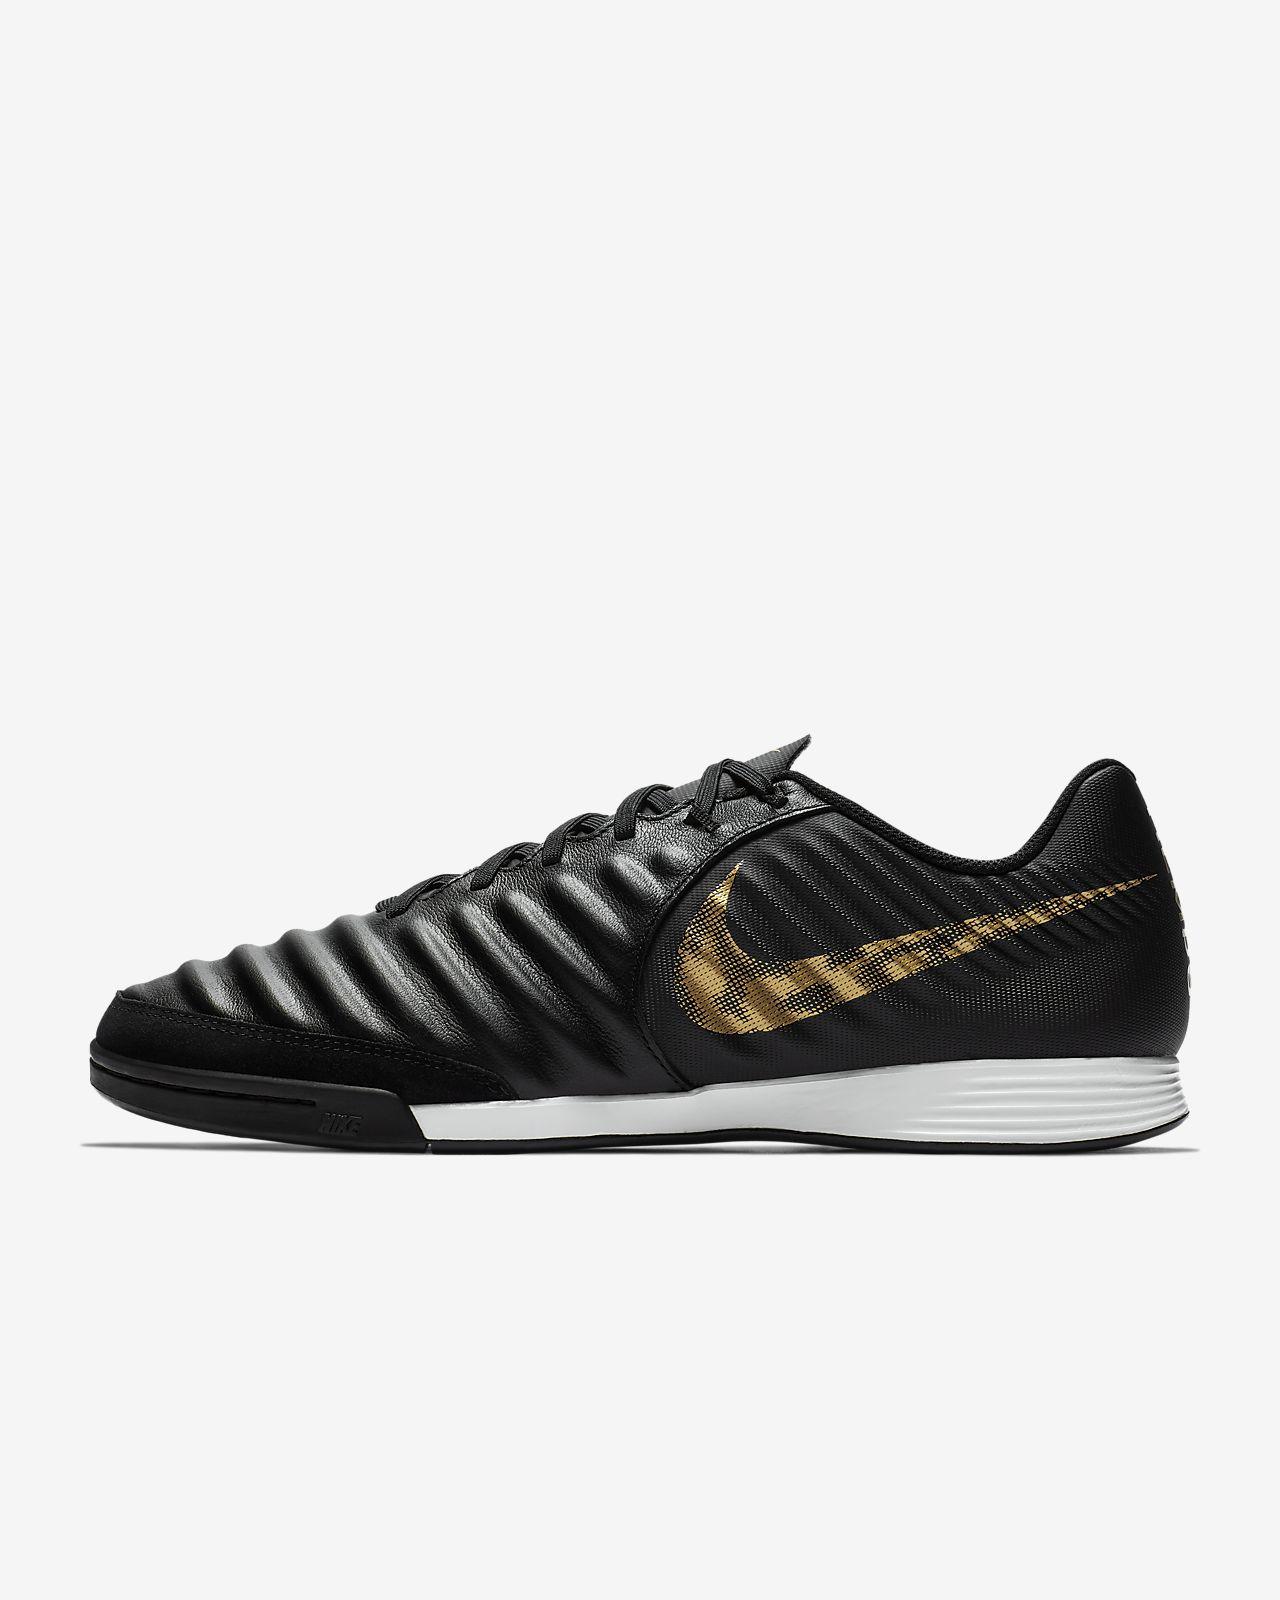 c672983ea2368 Nike LegendX 7 Academy IC Botas de fútbol sala. Nike.com ES